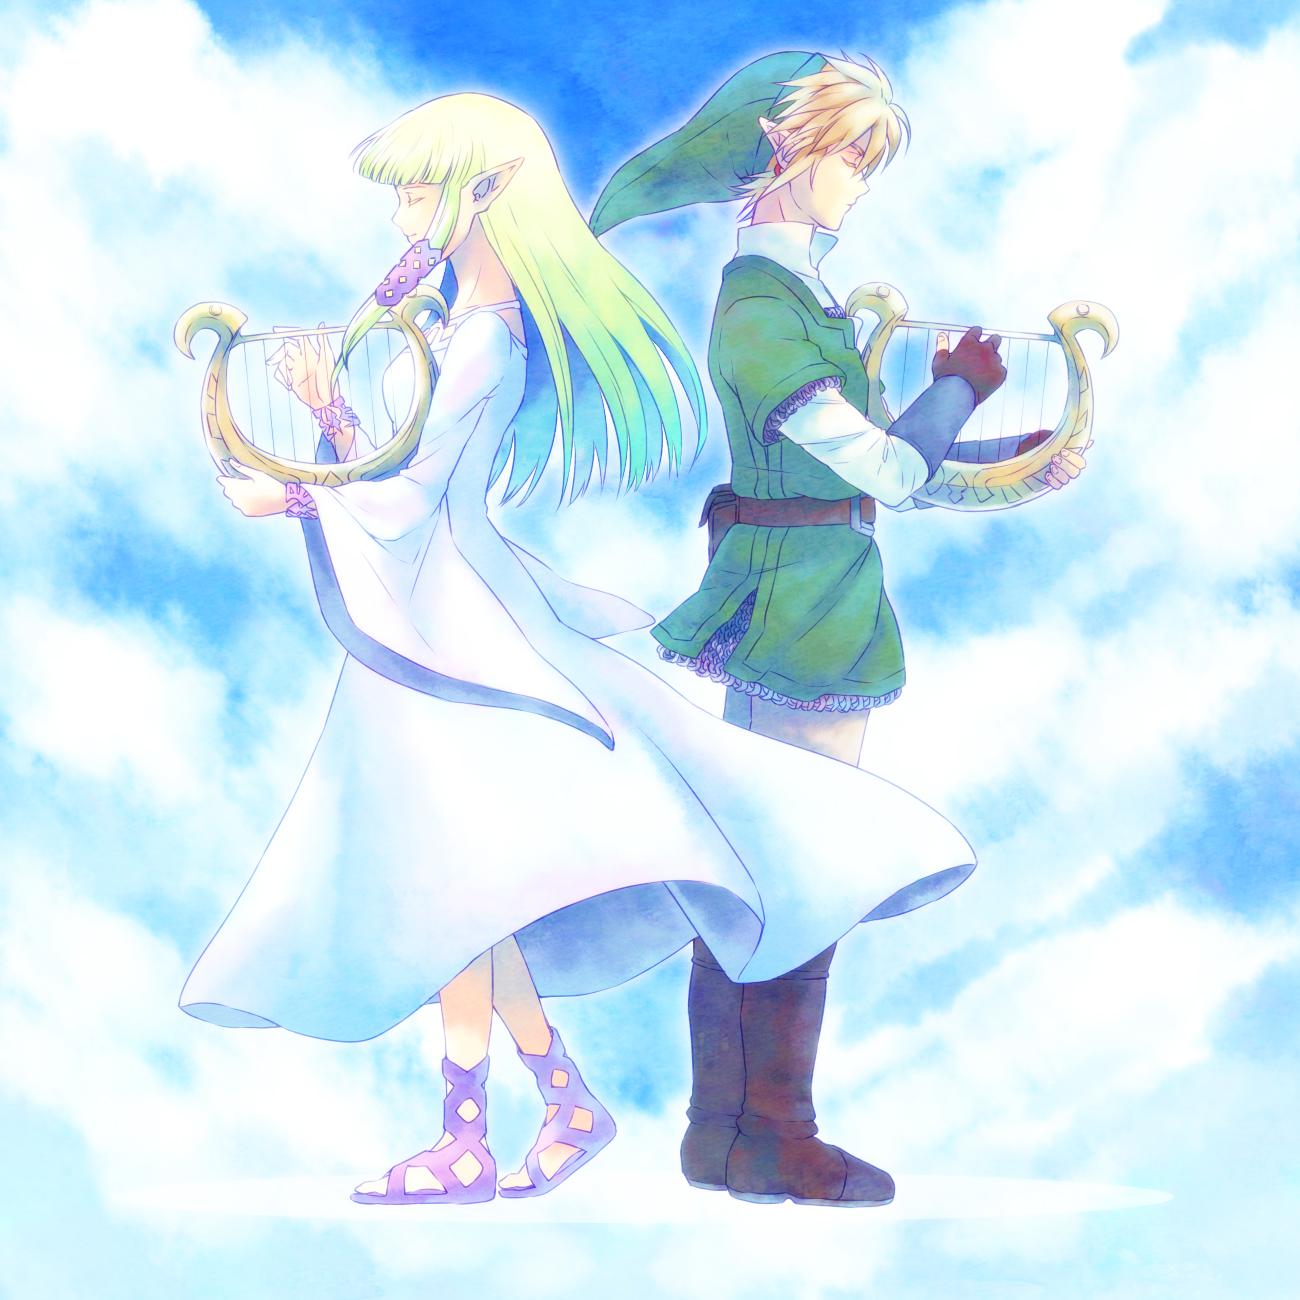 Zelda No Densetsu Skyward Sword Image 1452493 Zerochan